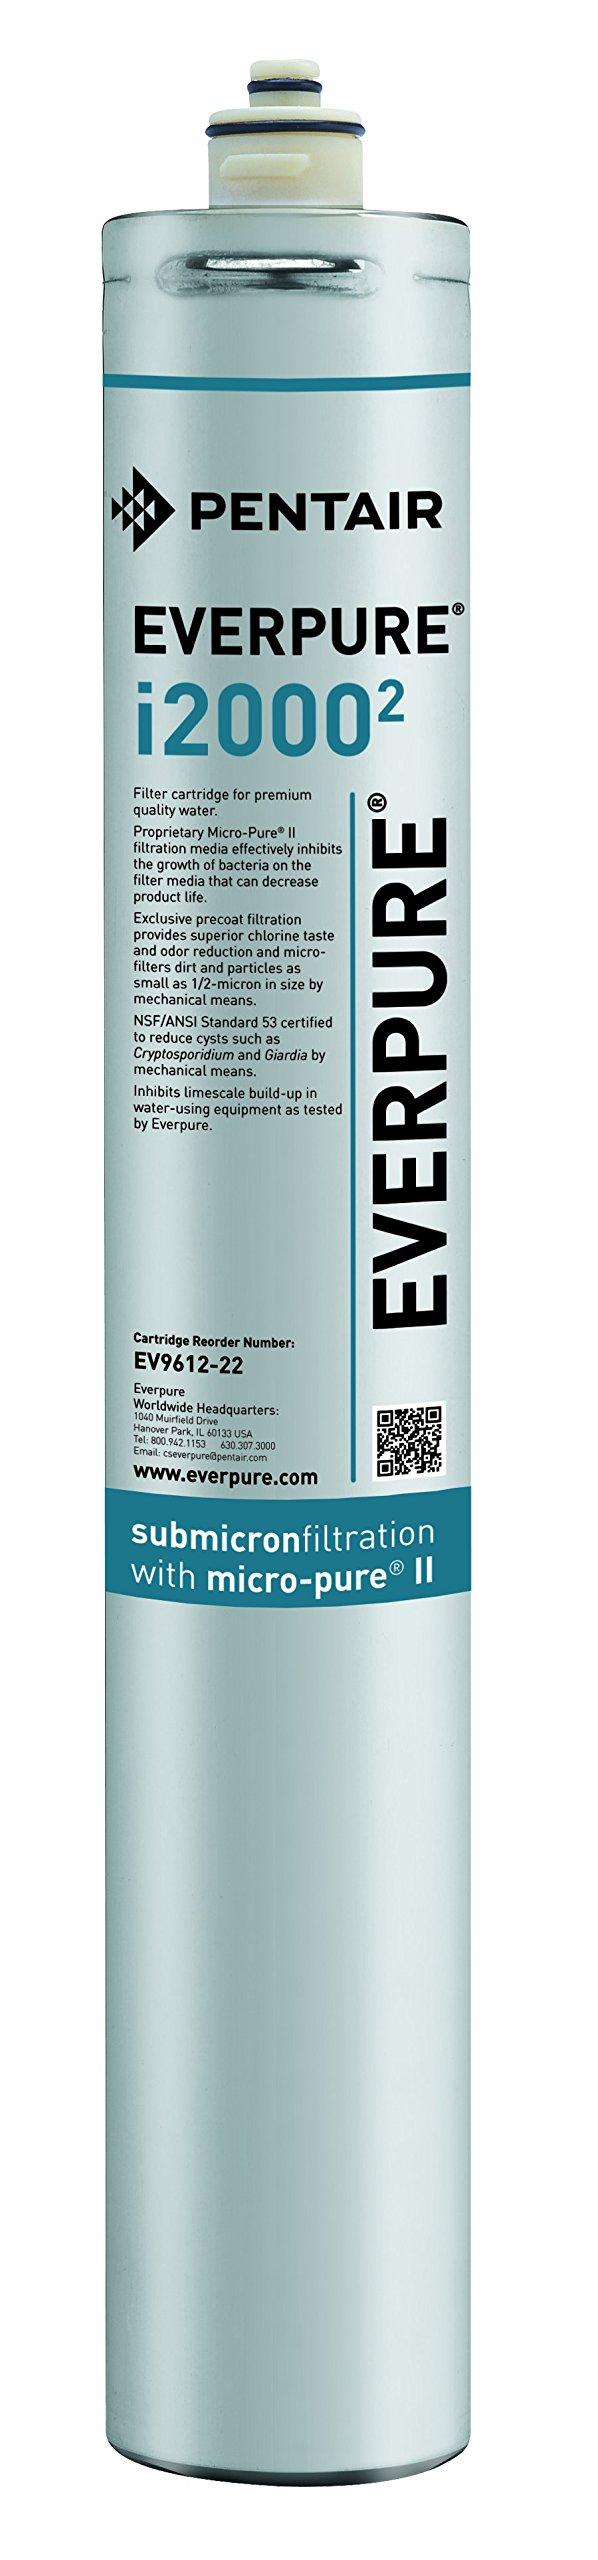 Everpure EV9612-22 i2000^2 Filter Cartridge